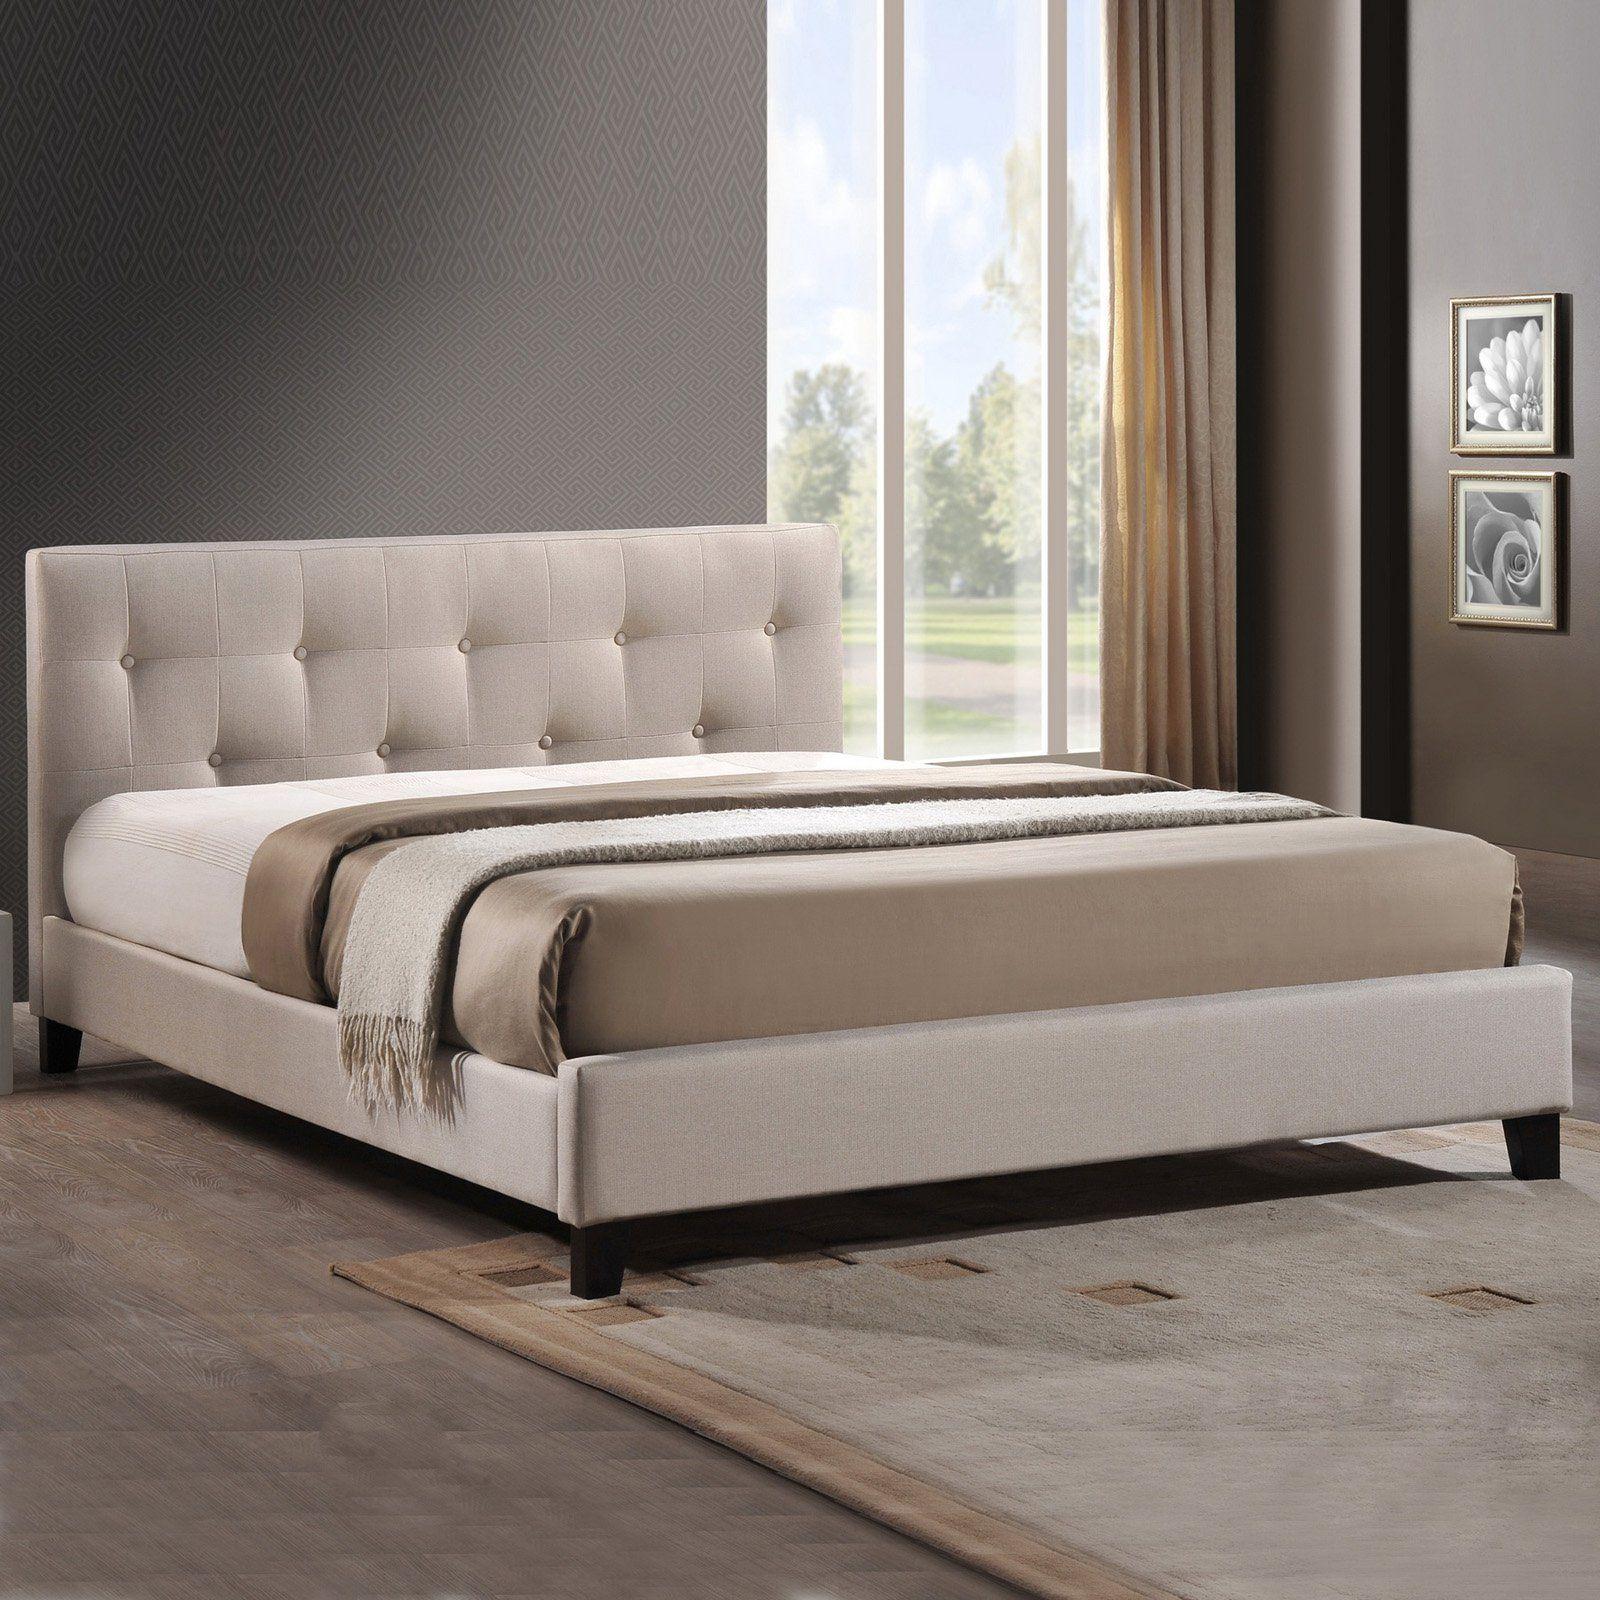 Harriette Platform Bed - The Harriette Linen Modern Bed with Covered ...